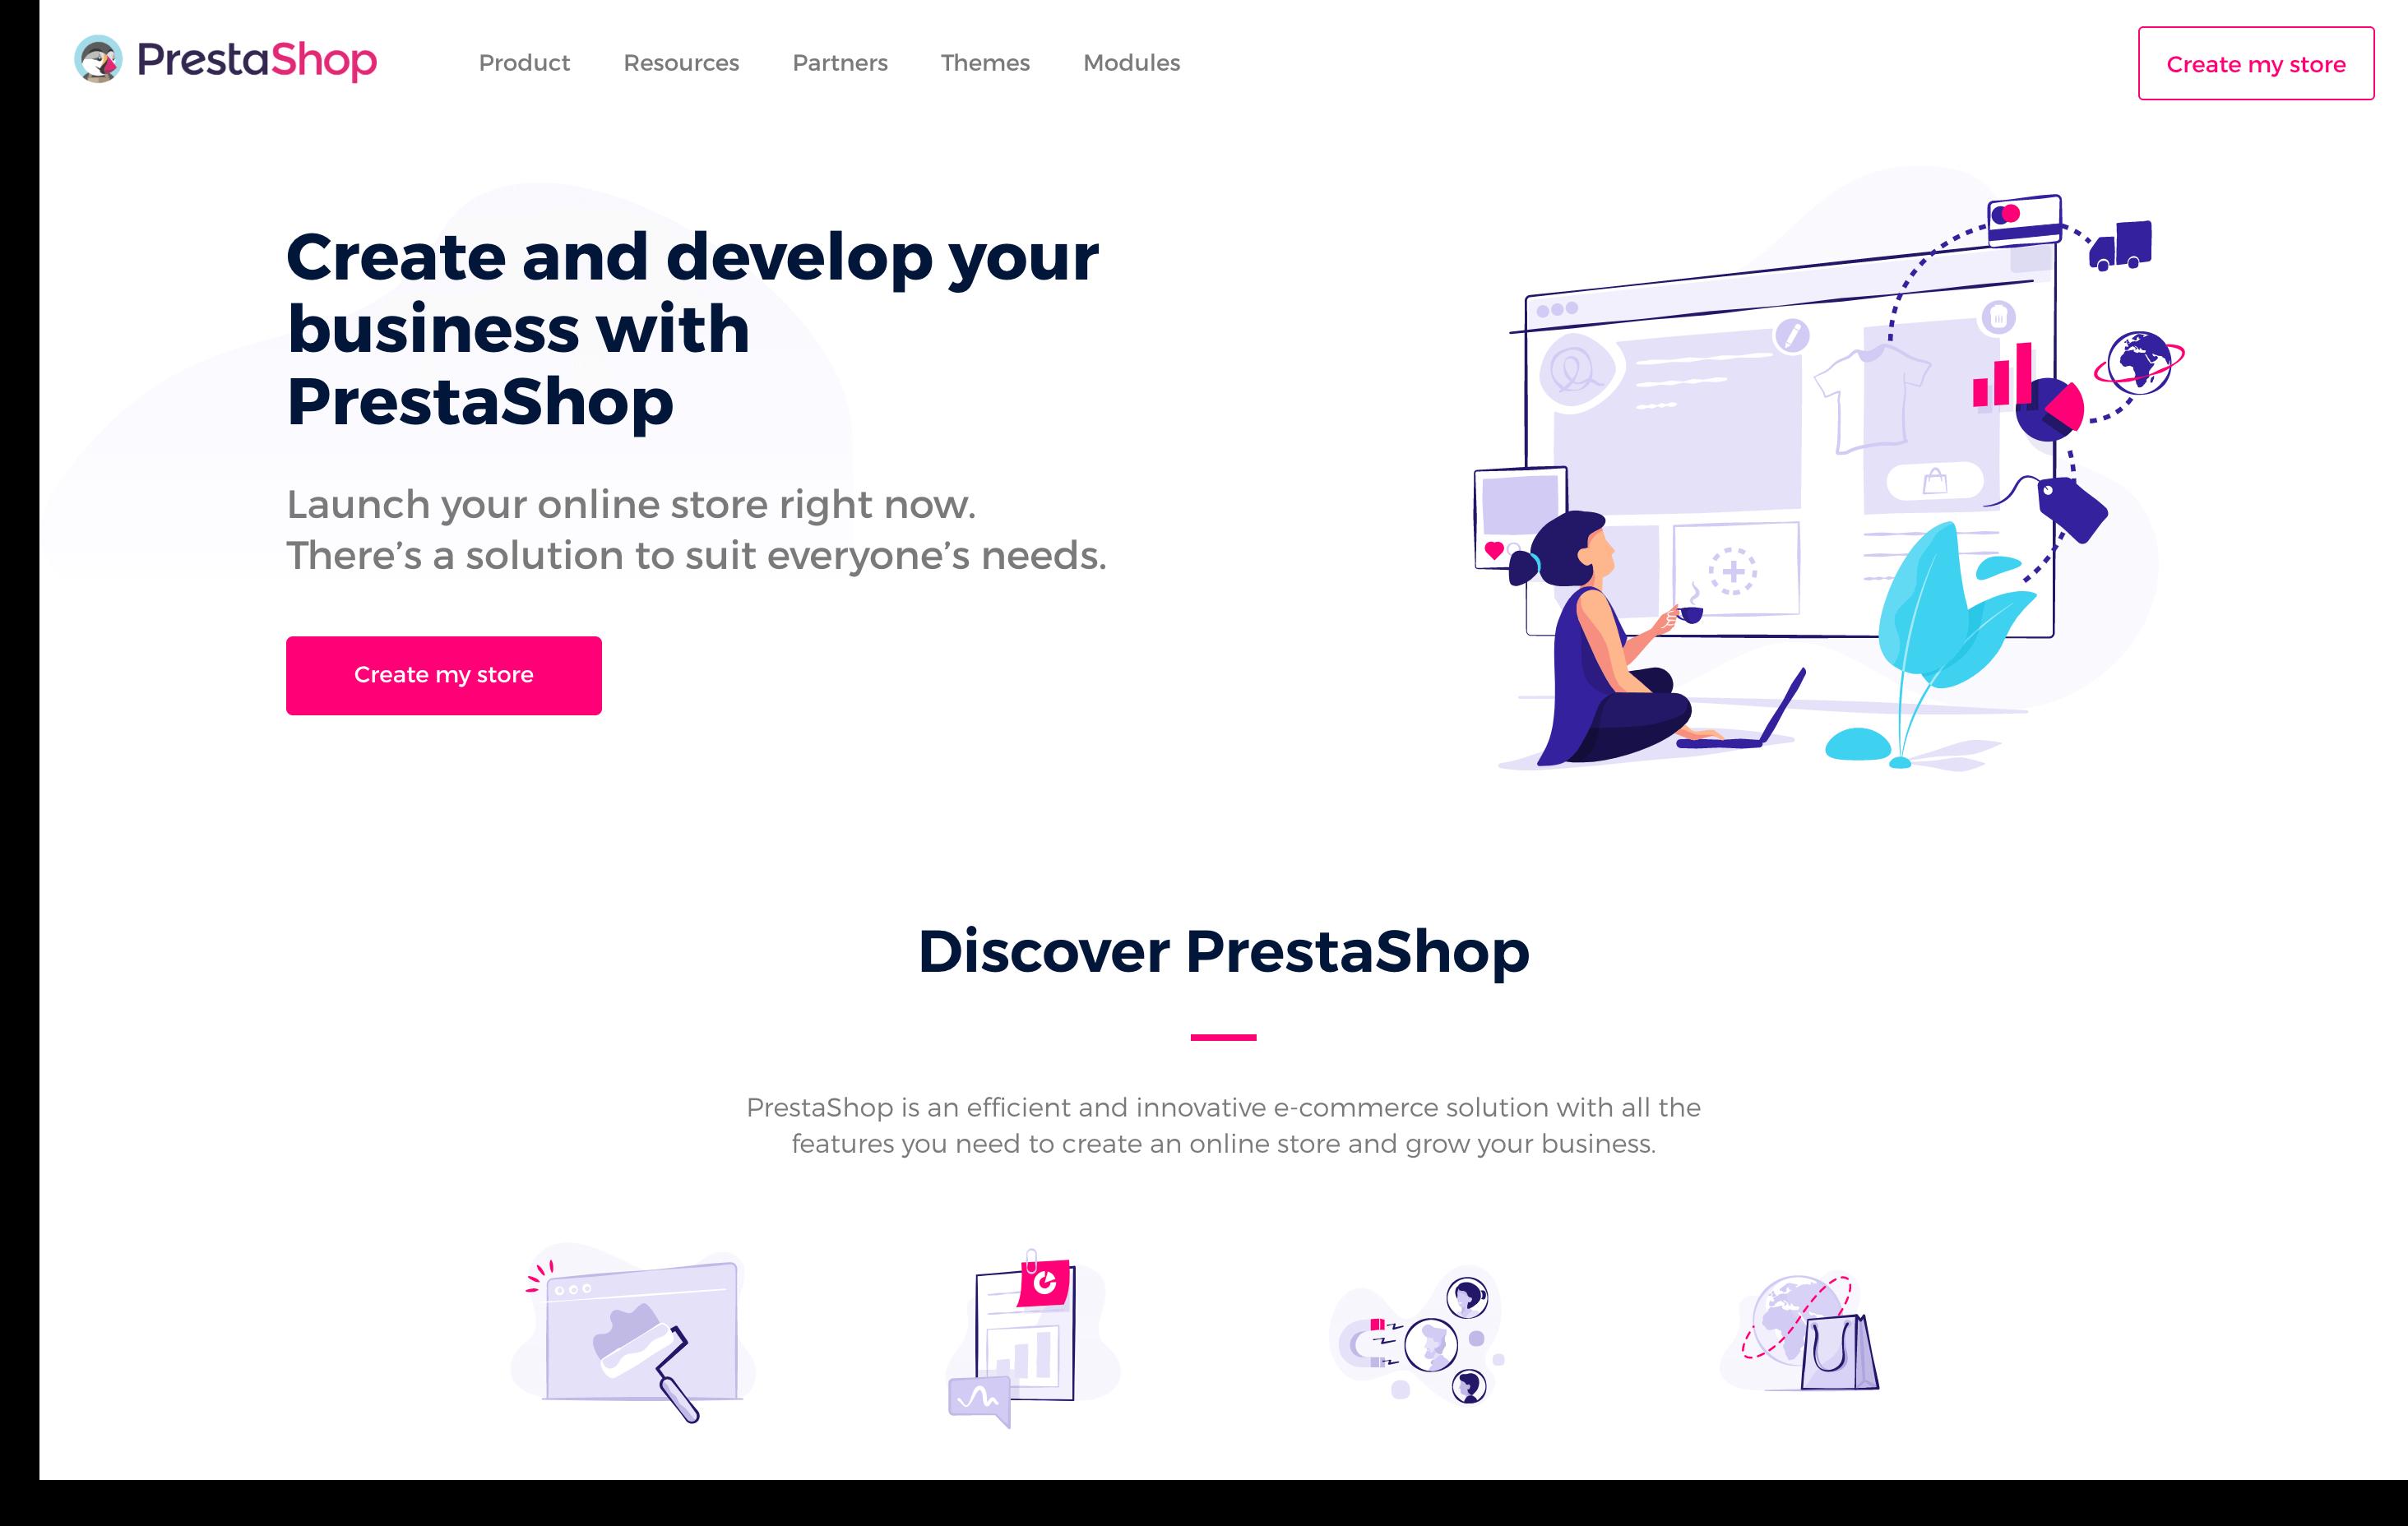 prestashop homepage